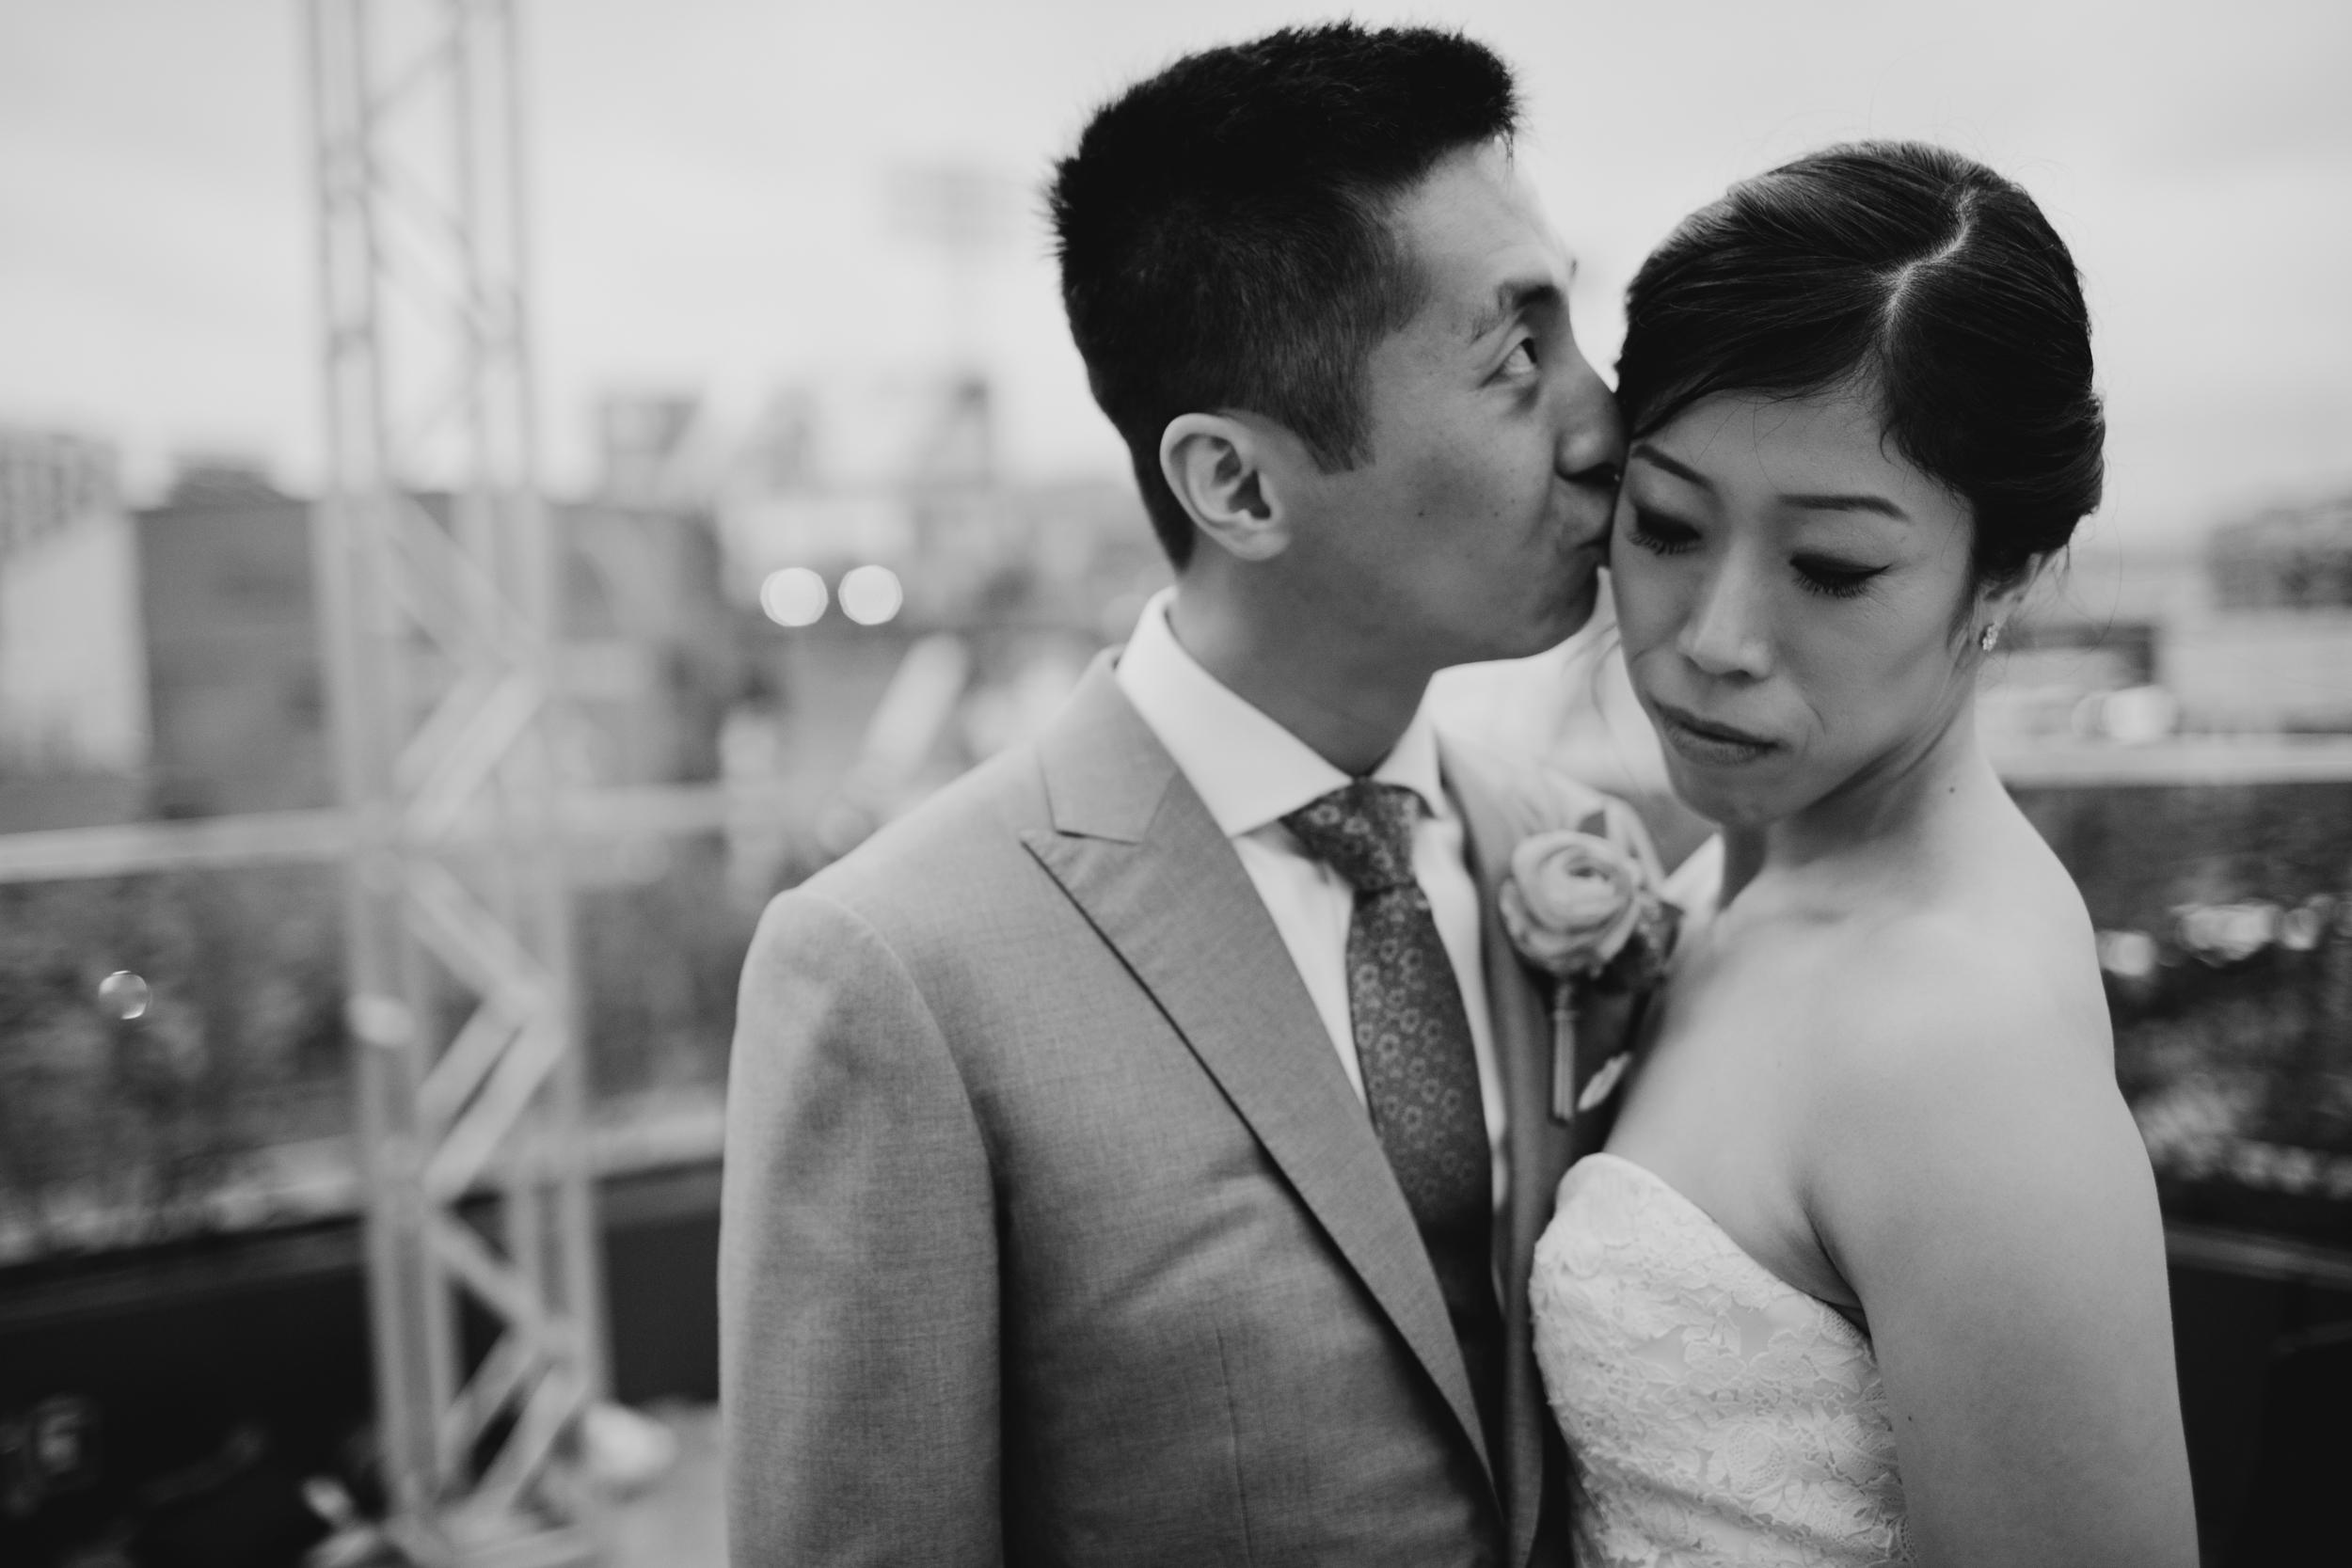 Mindy_Bo_Boston_Wedding_MIT_HotelCommonwealth_030.jpg